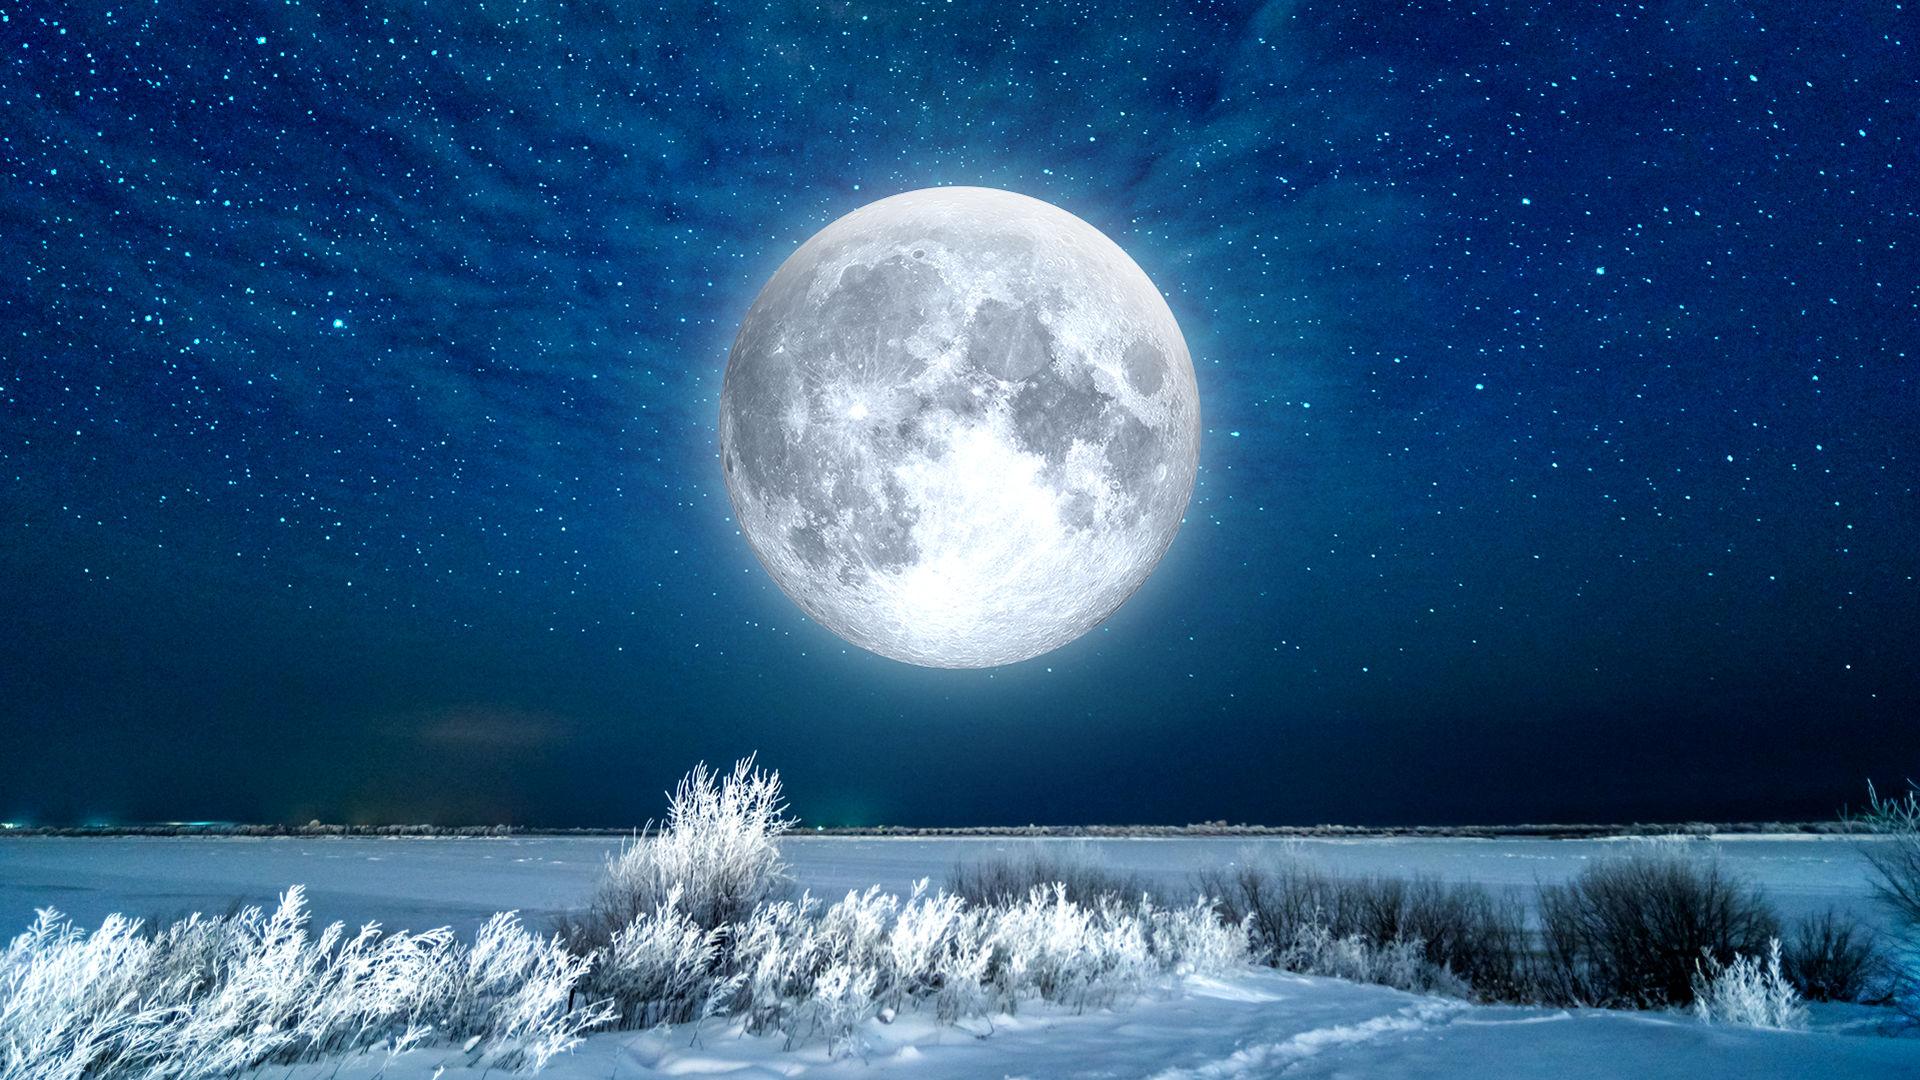 Full Snow Moon 2020: Is It a Supermoon?